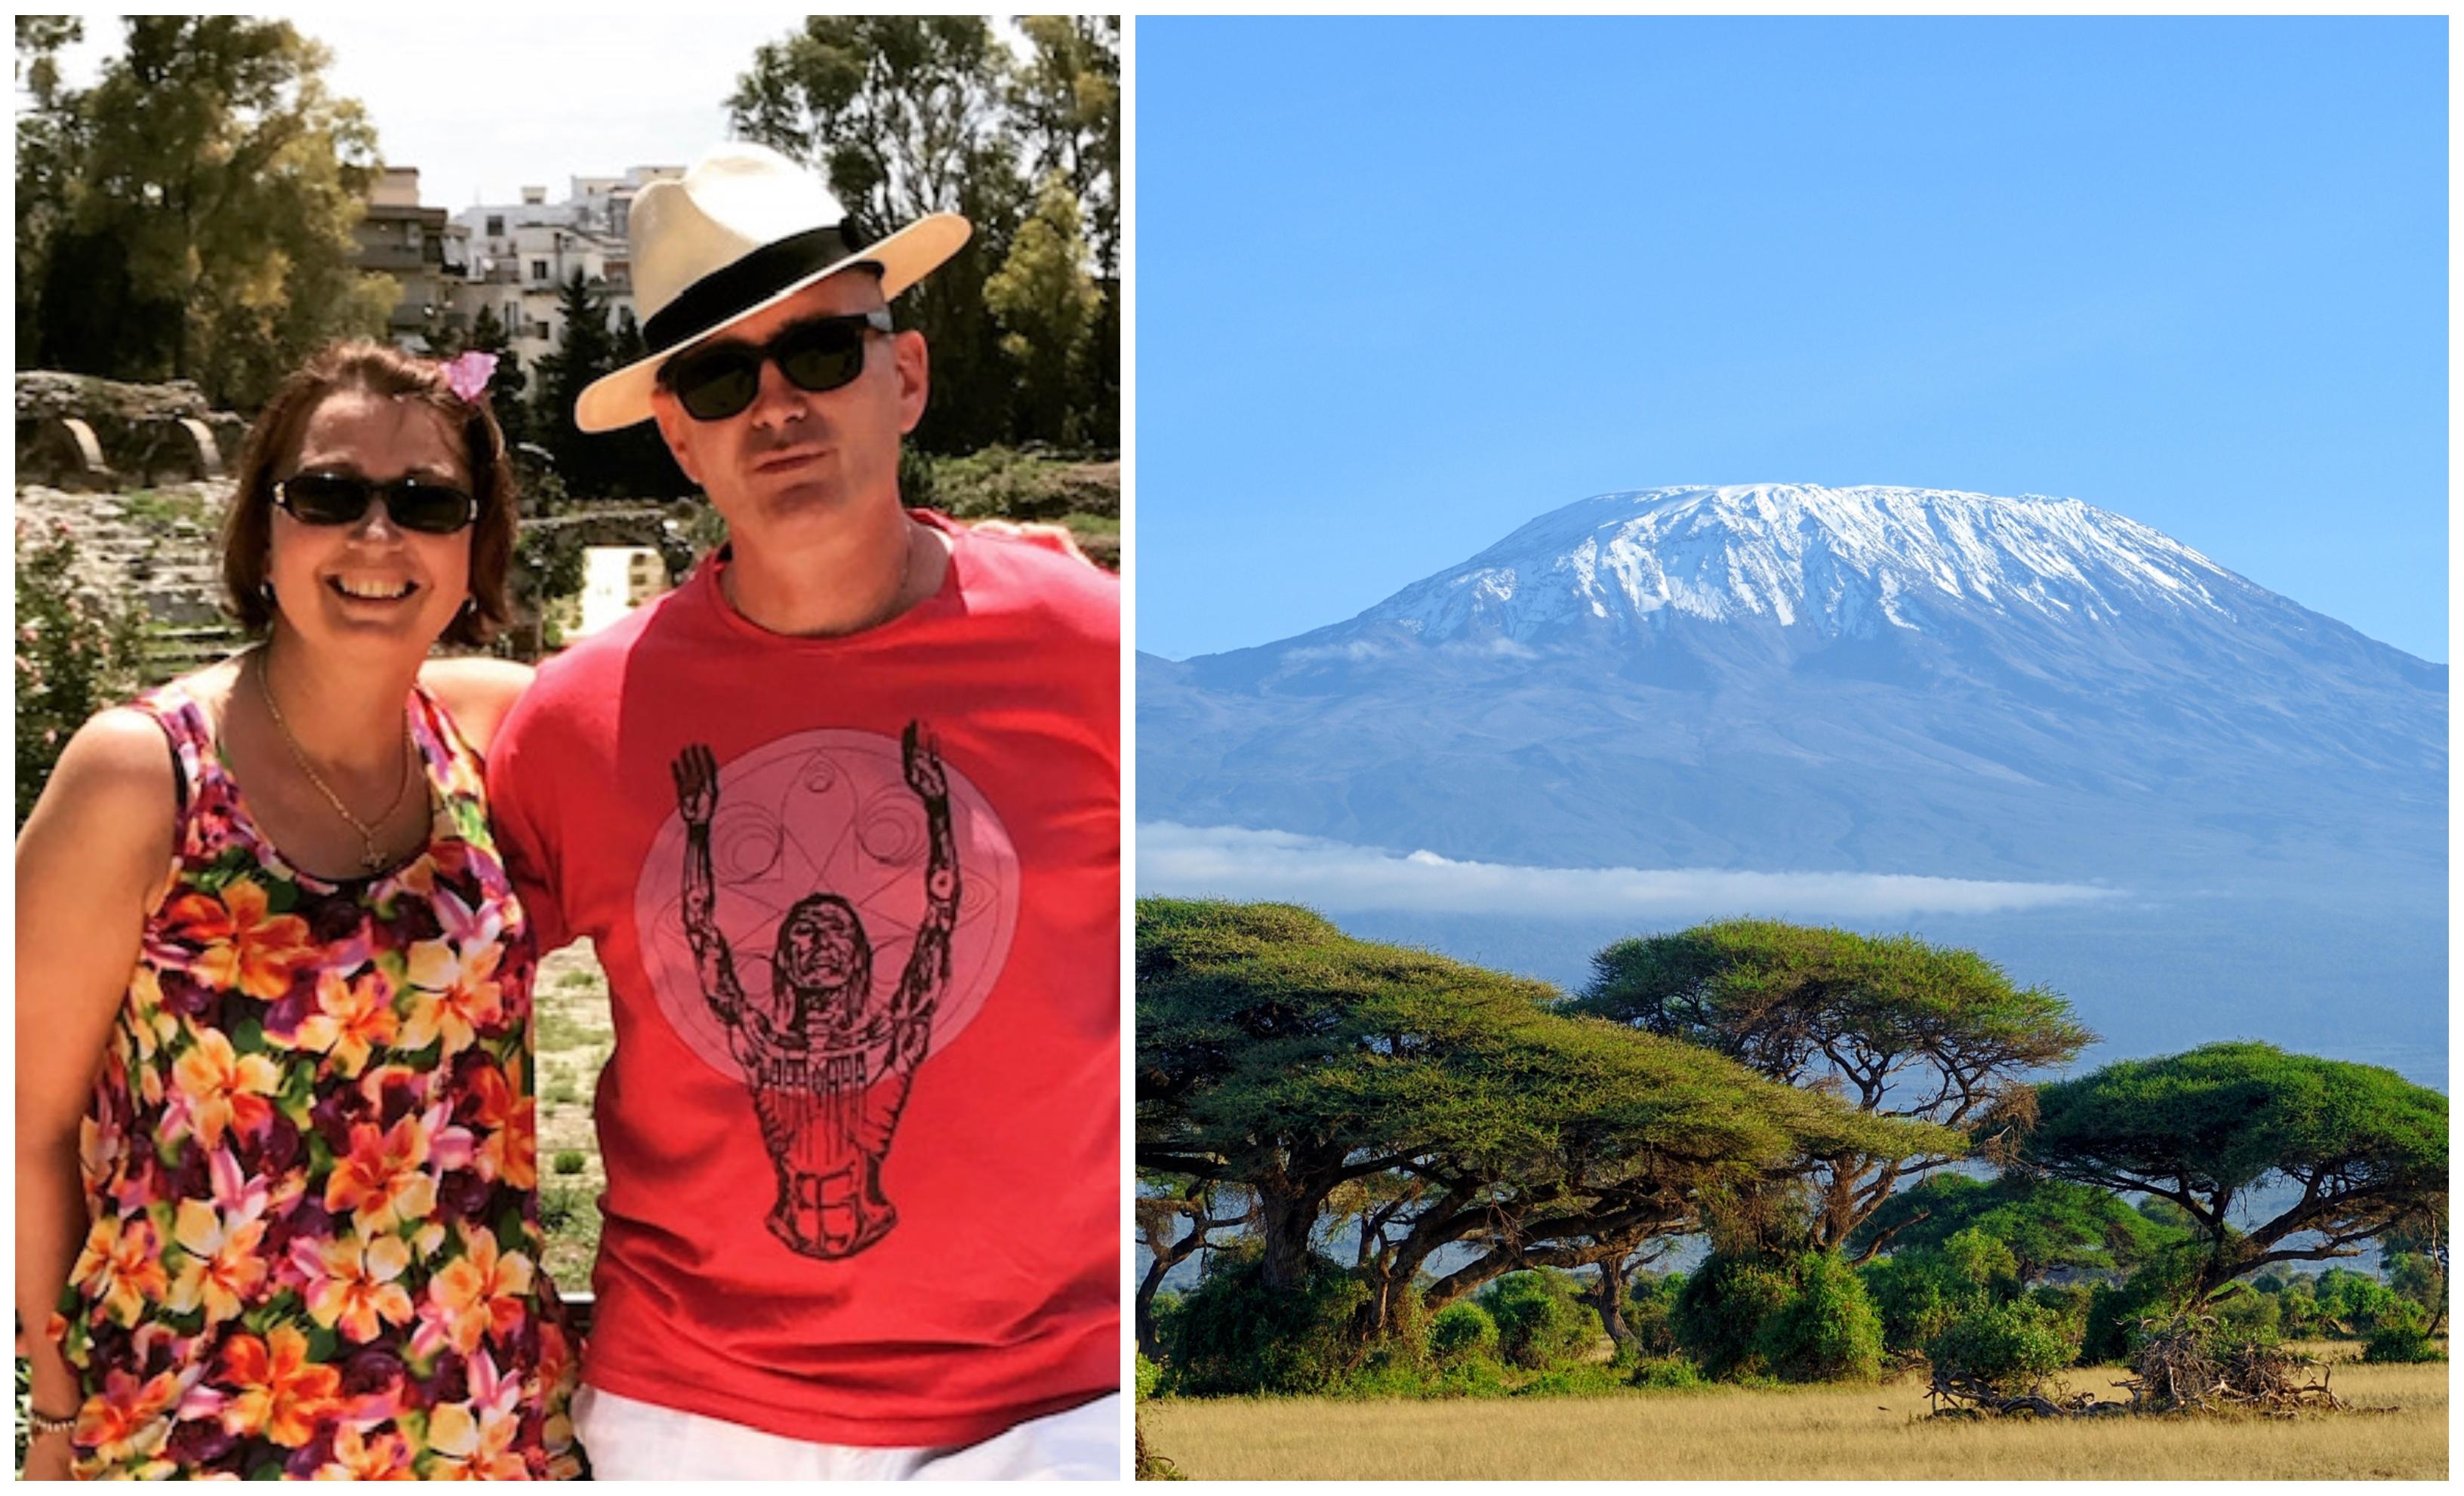 Varry and Jonny Lavin are raising money for TB Alert, with Jonny set to scale Kilimanjaro